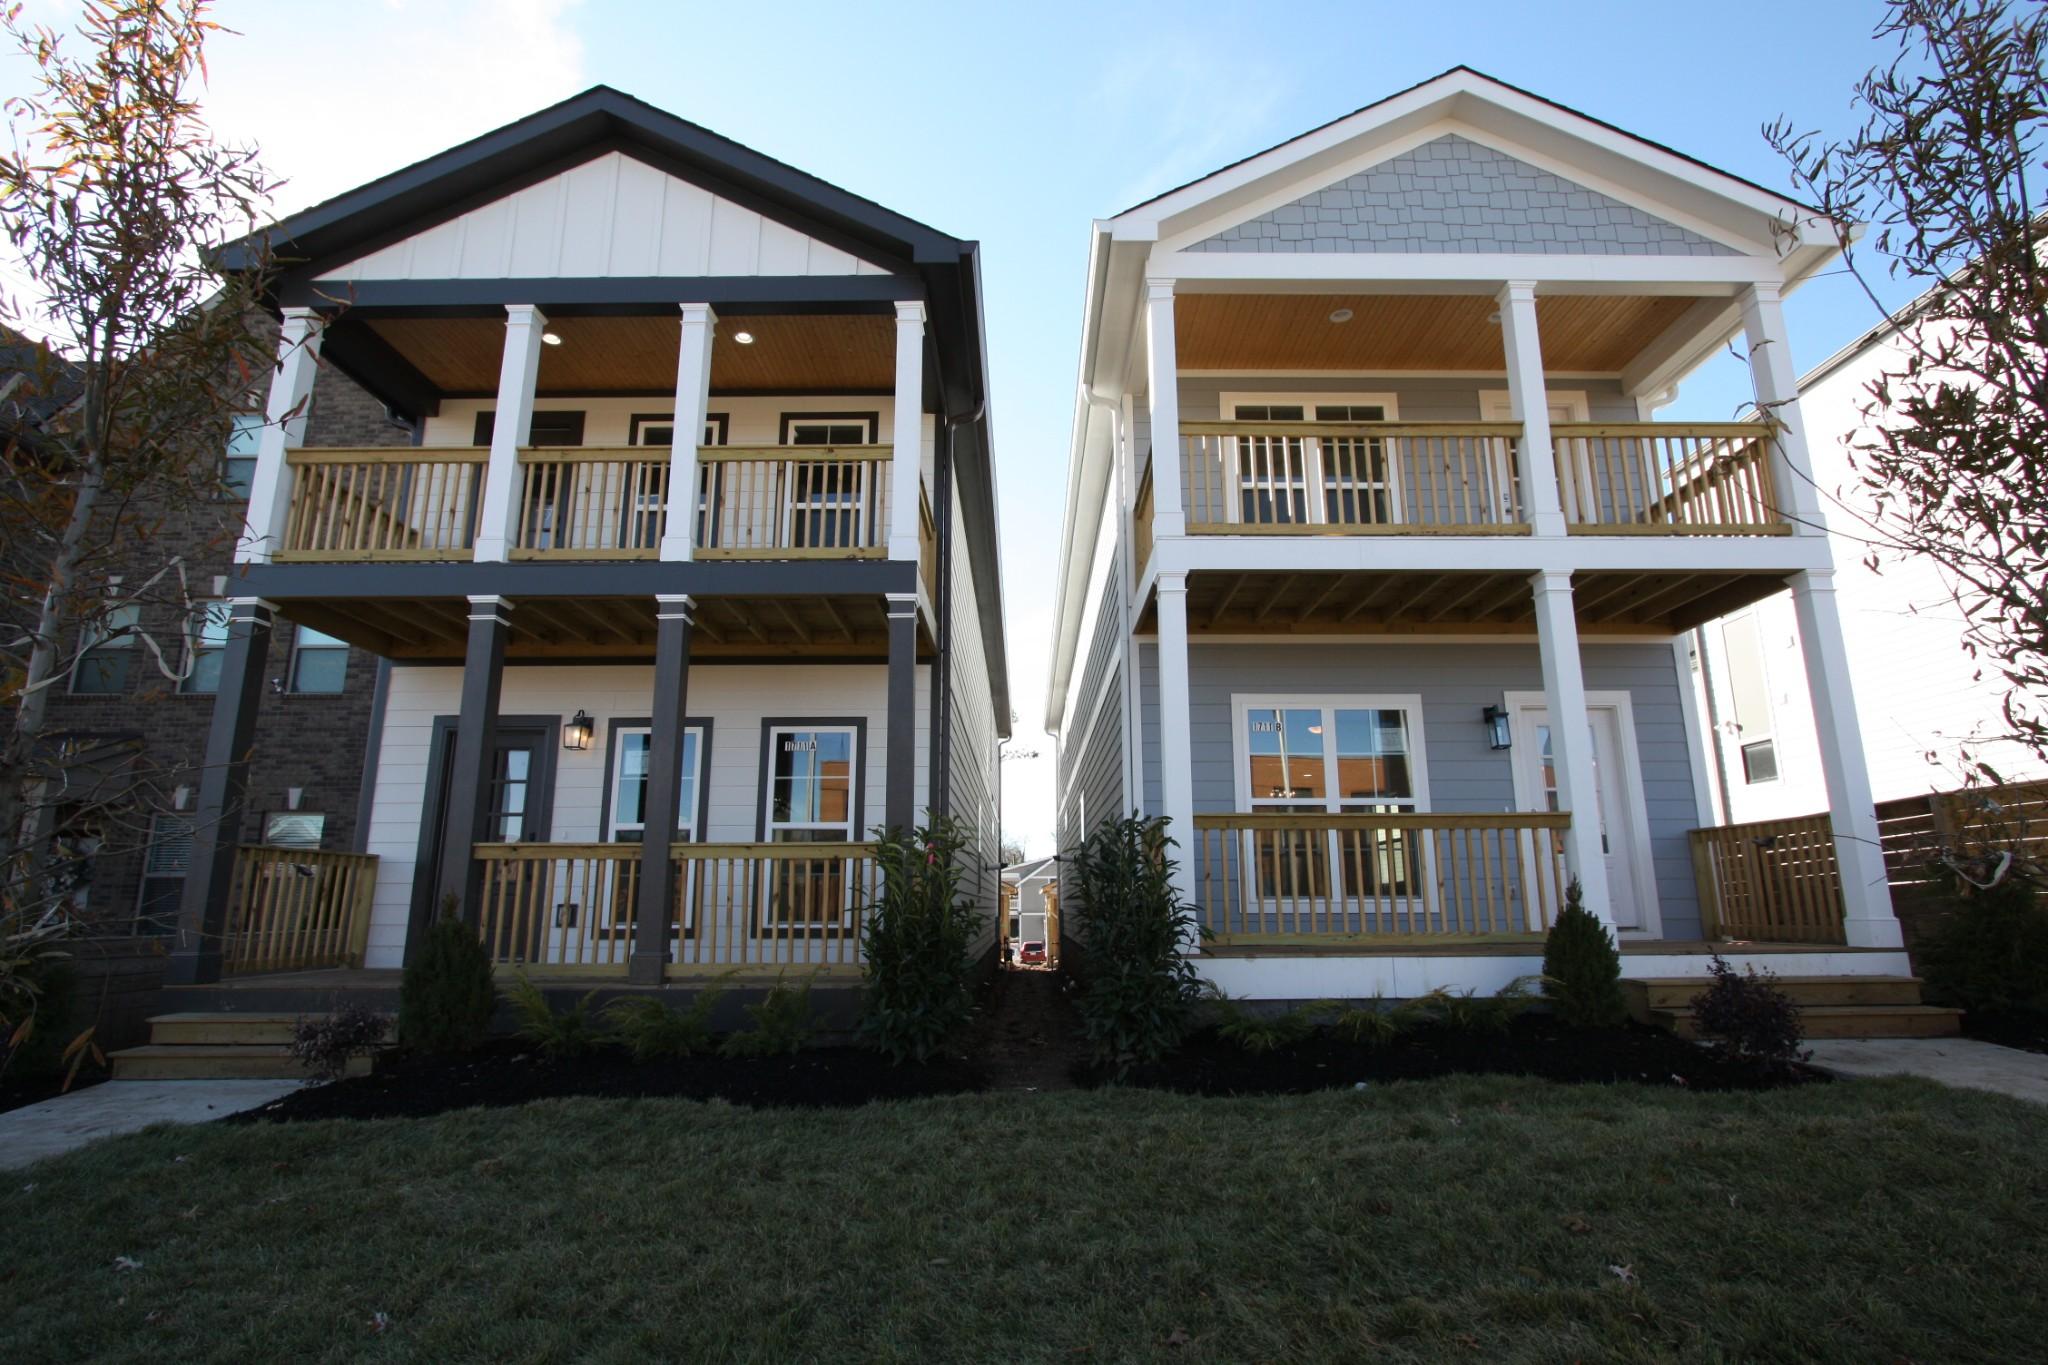 1711B 3rd Ave, N, Nashville, TN 37208 - Nashville, TN real estate listing